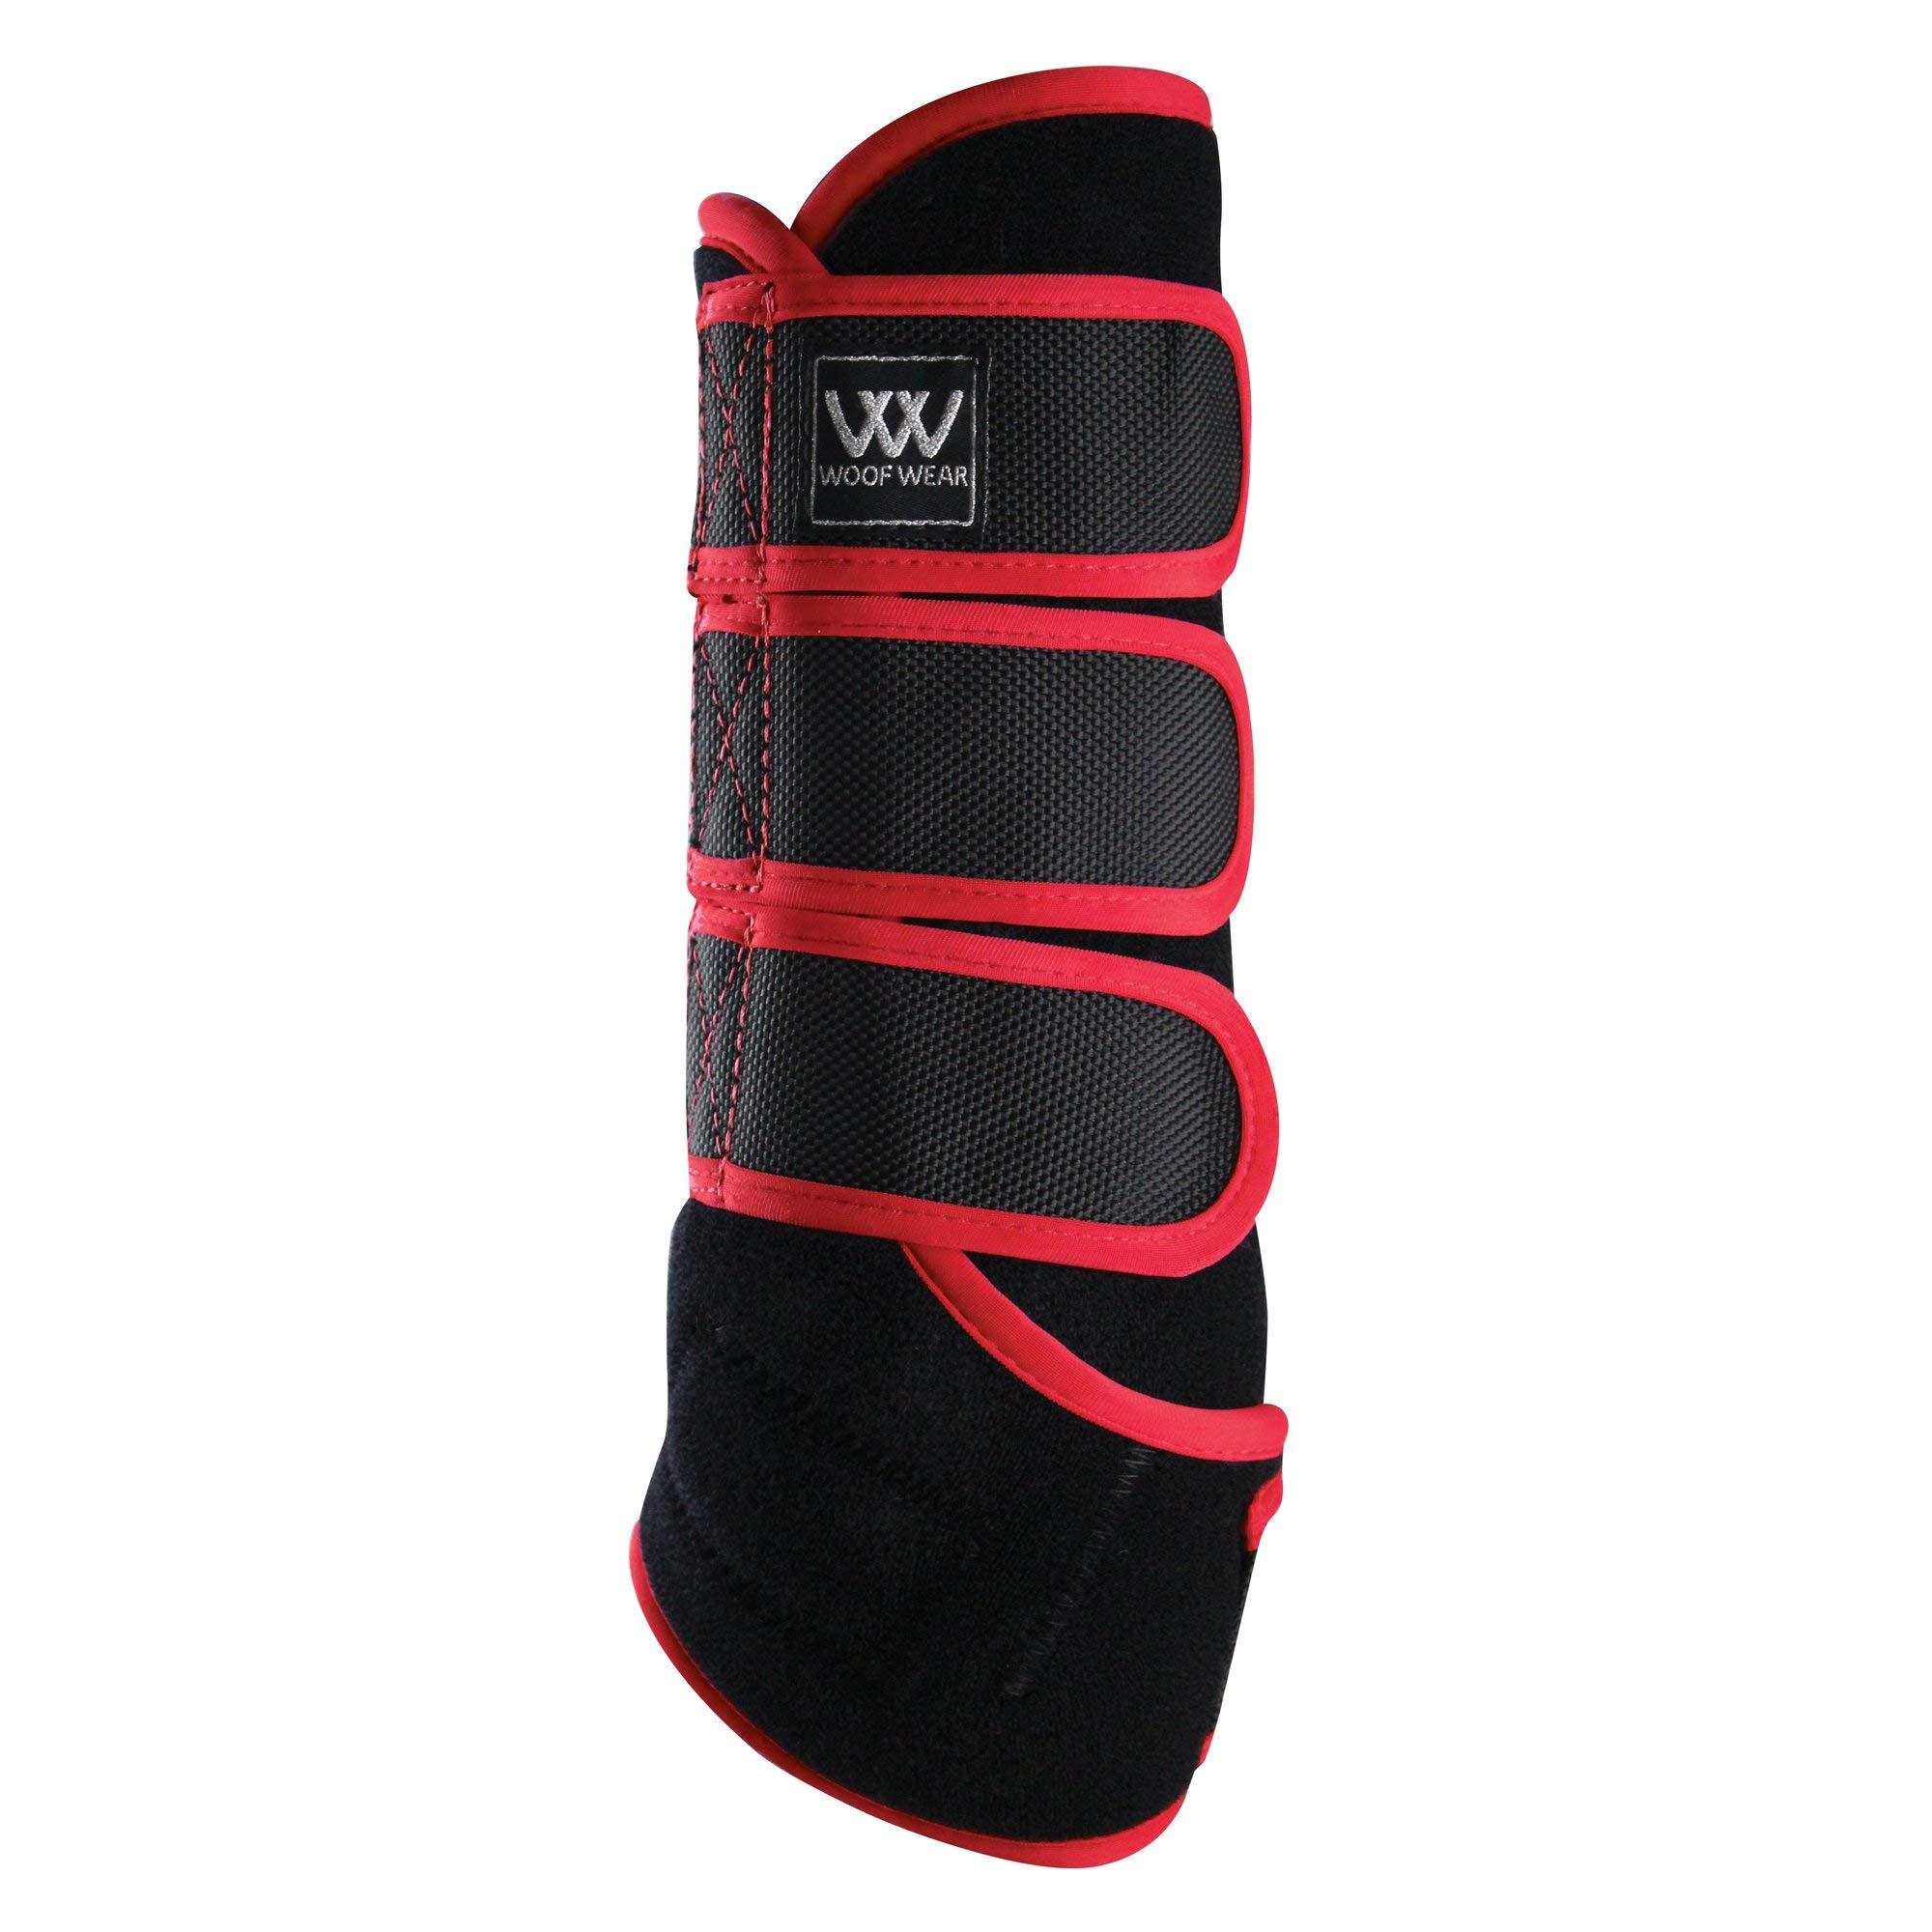 WOOF WEAR Dressage Exercise Wrap Medium Black Royal Red